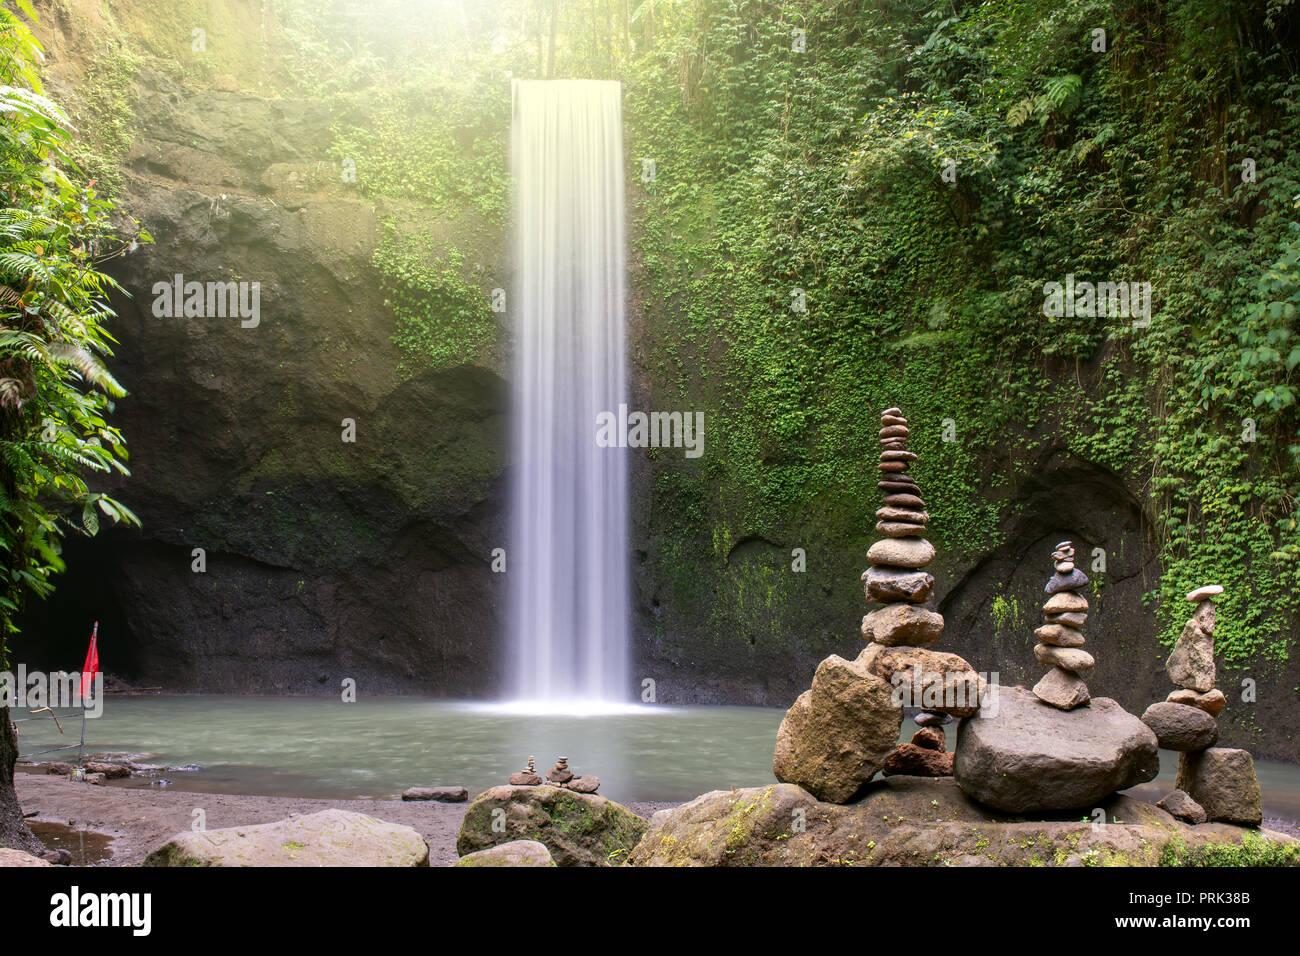 Hermosa cascada Tibumana en Bangli, Bali, Indonesia Foto de stock